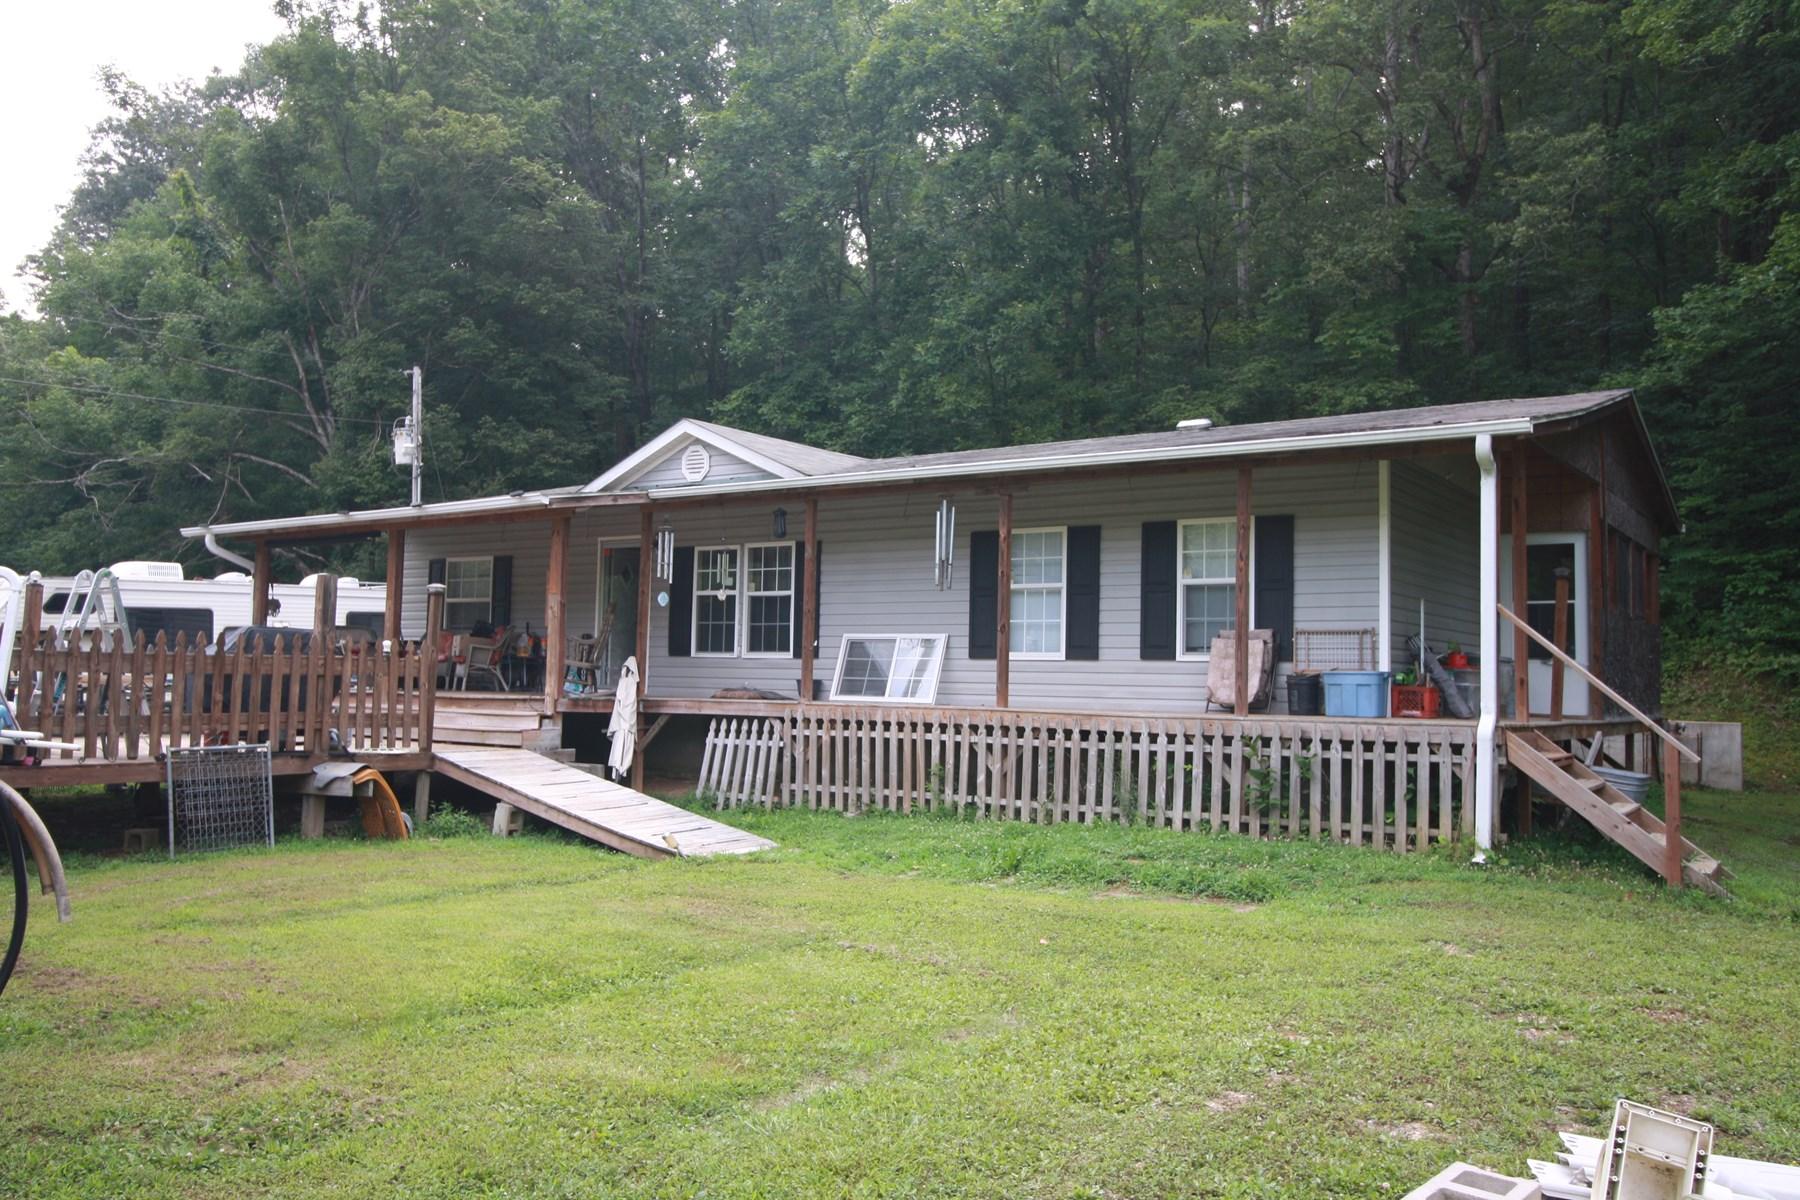 Wayne County Missouri Home and land for sale